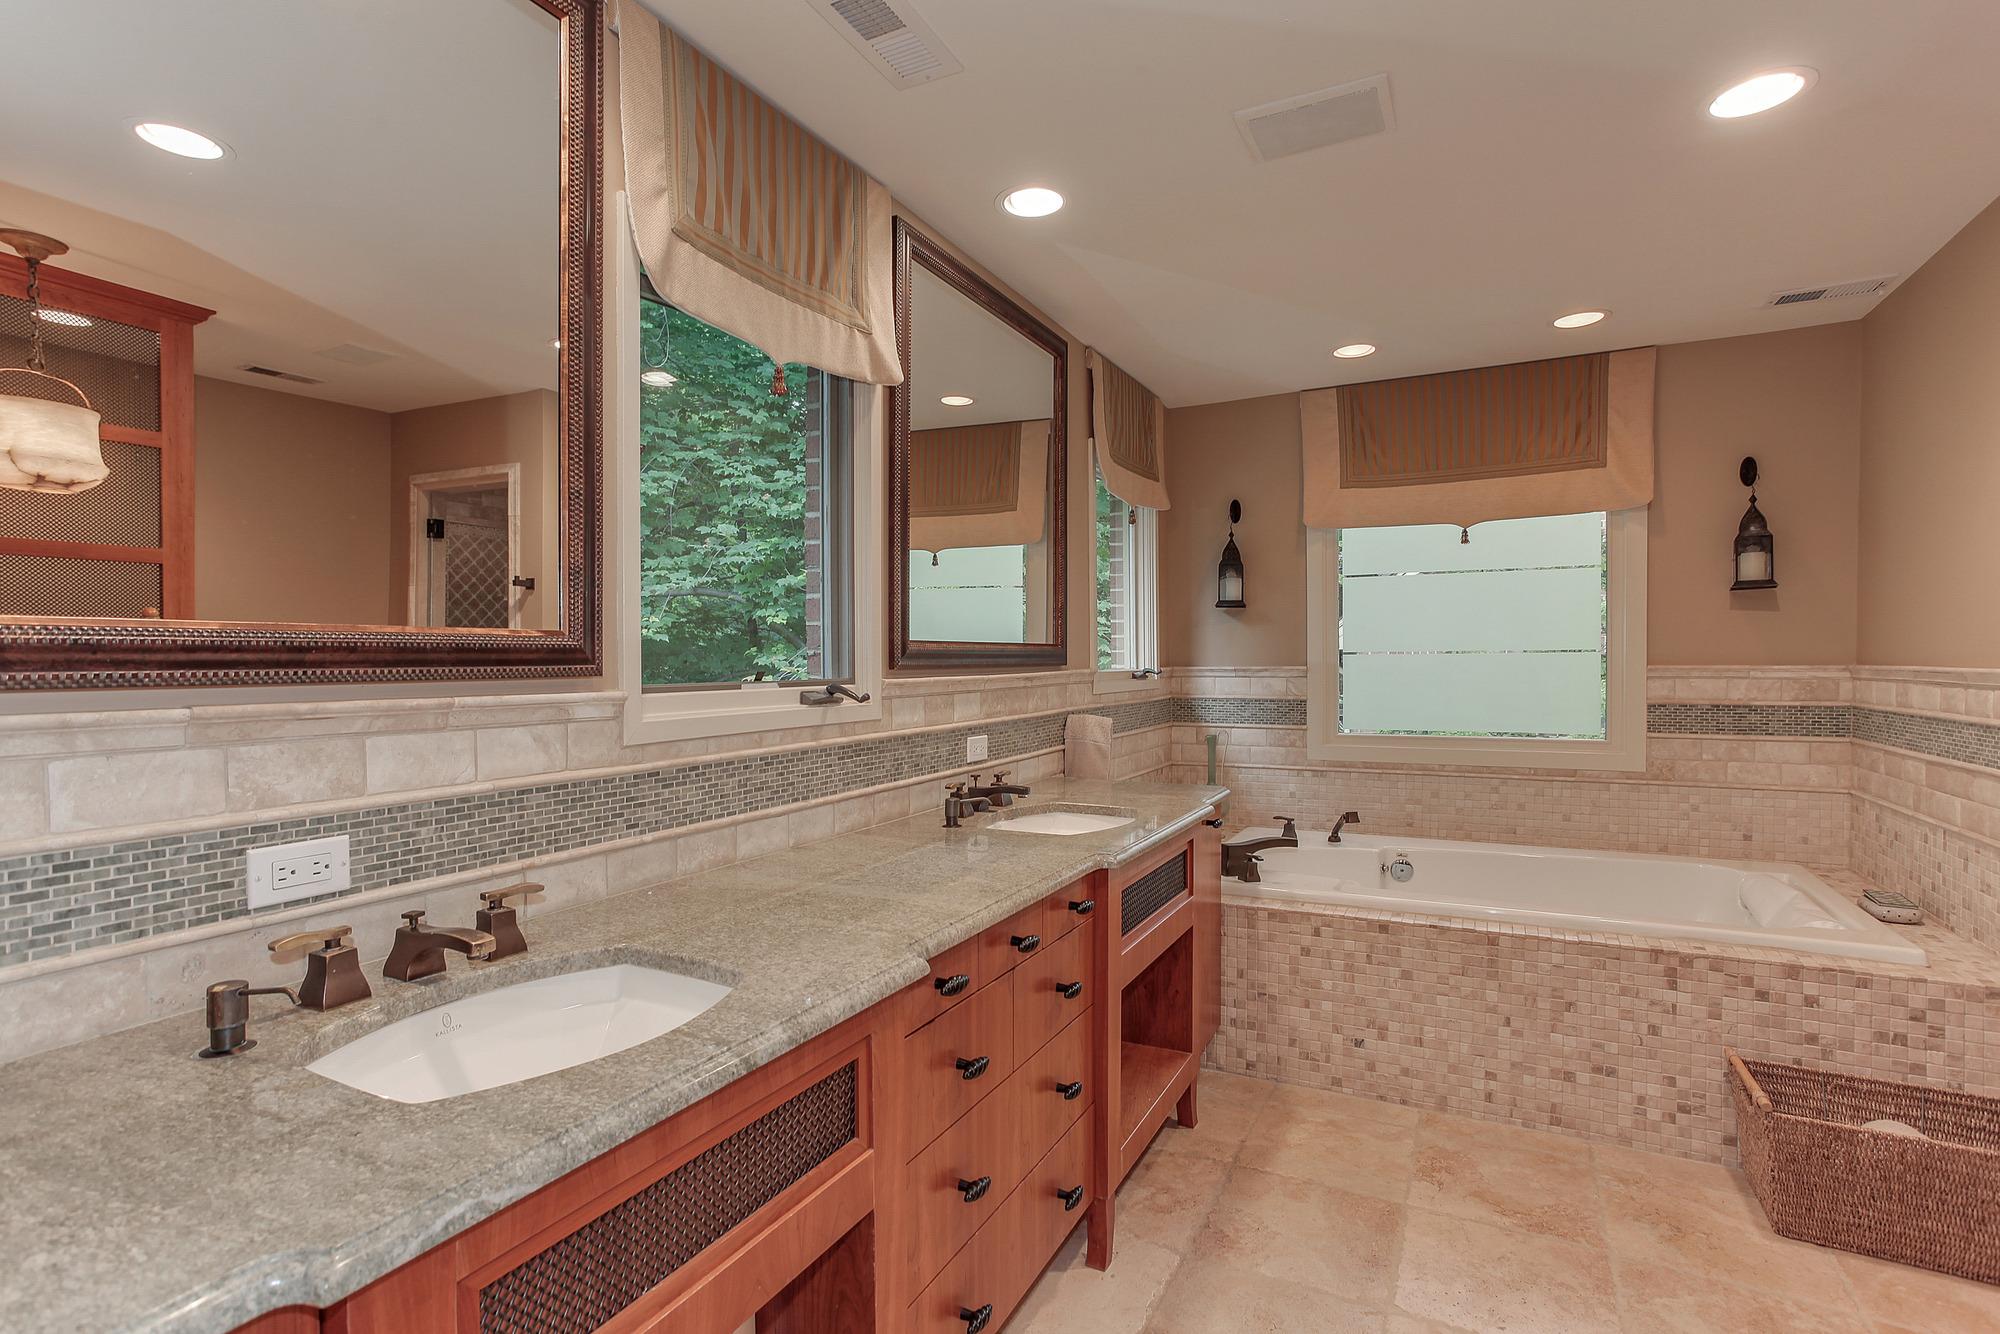 Bethesda Maryland Master Suite Remodeling: 9649 EAGLE RIDGE DR, BETHESDA, MD 20817